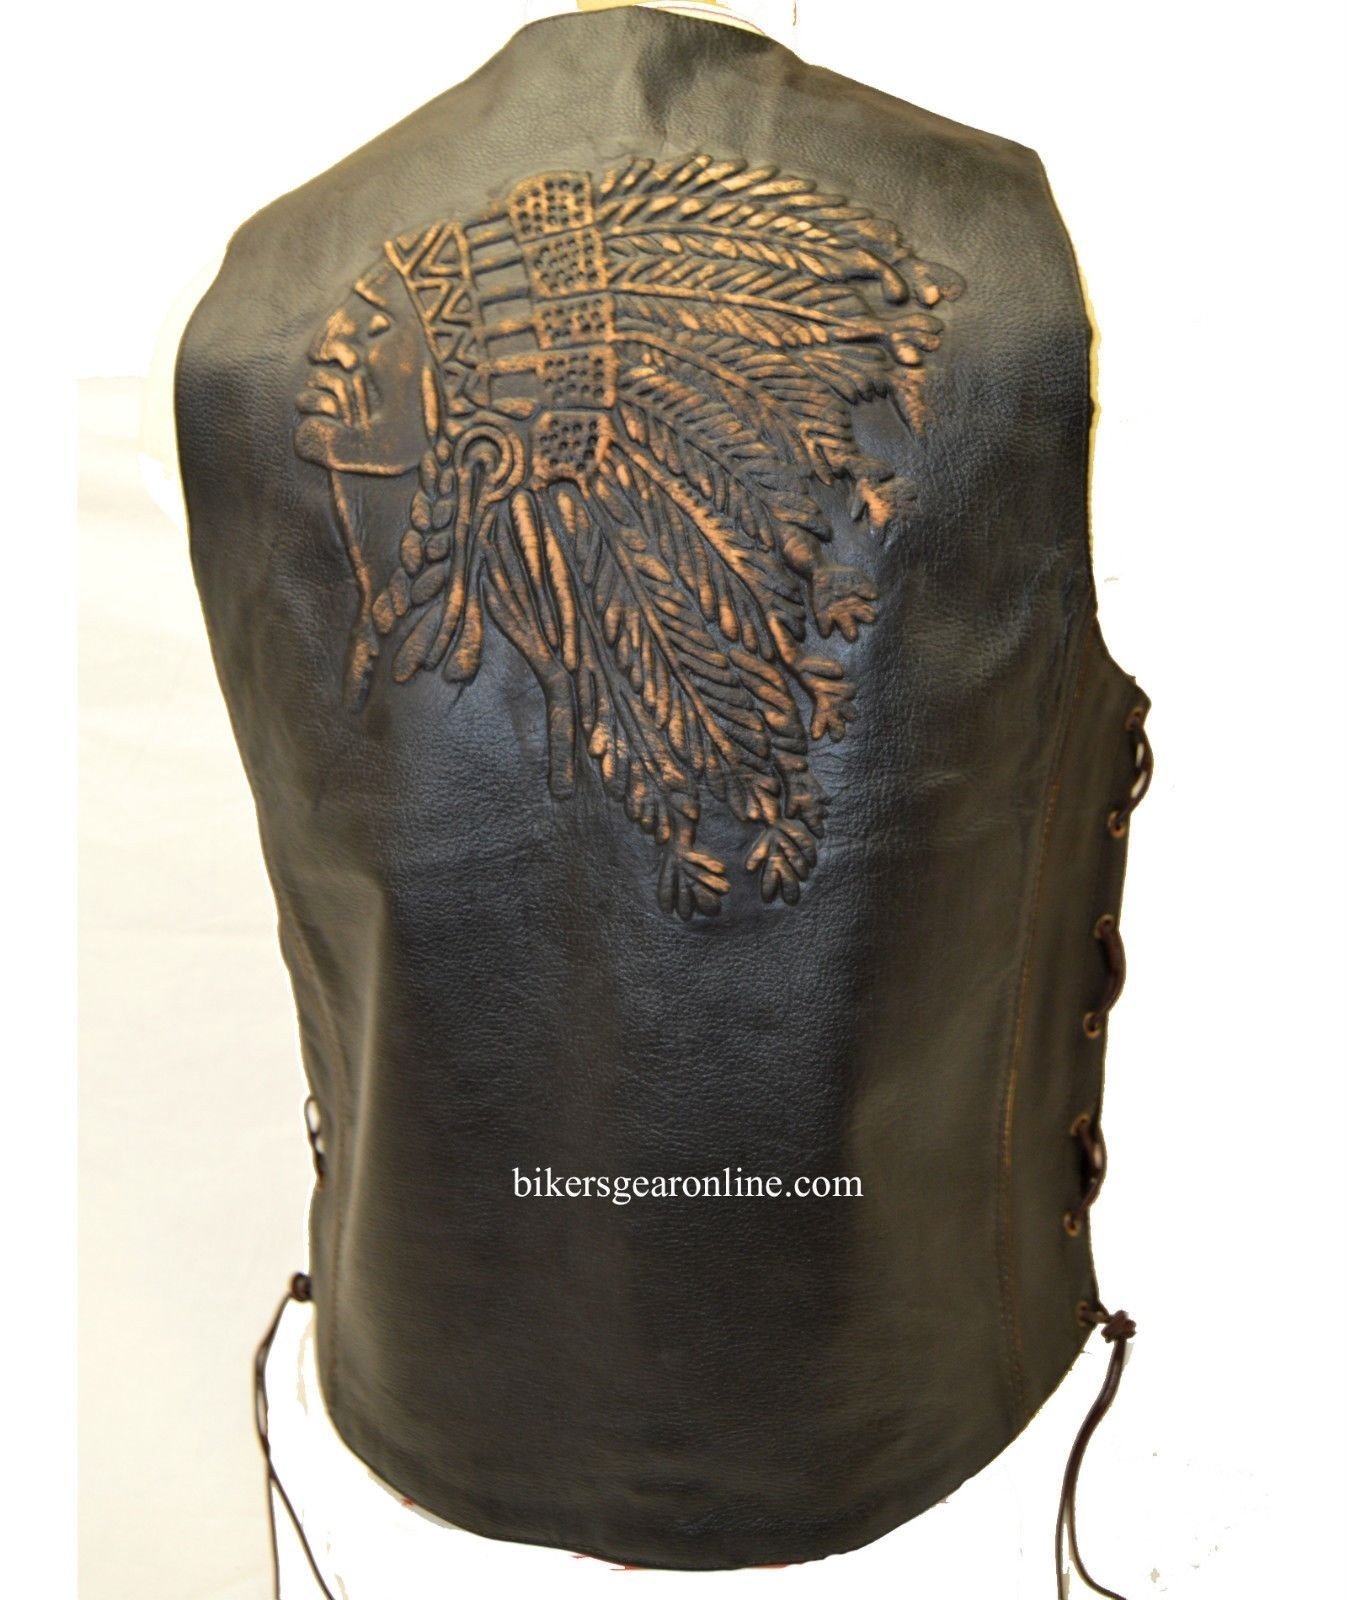 3XL DEFY Mens Genuine Leather Motorcycle Biker Concealed Carry Vintage Vest American Sizes